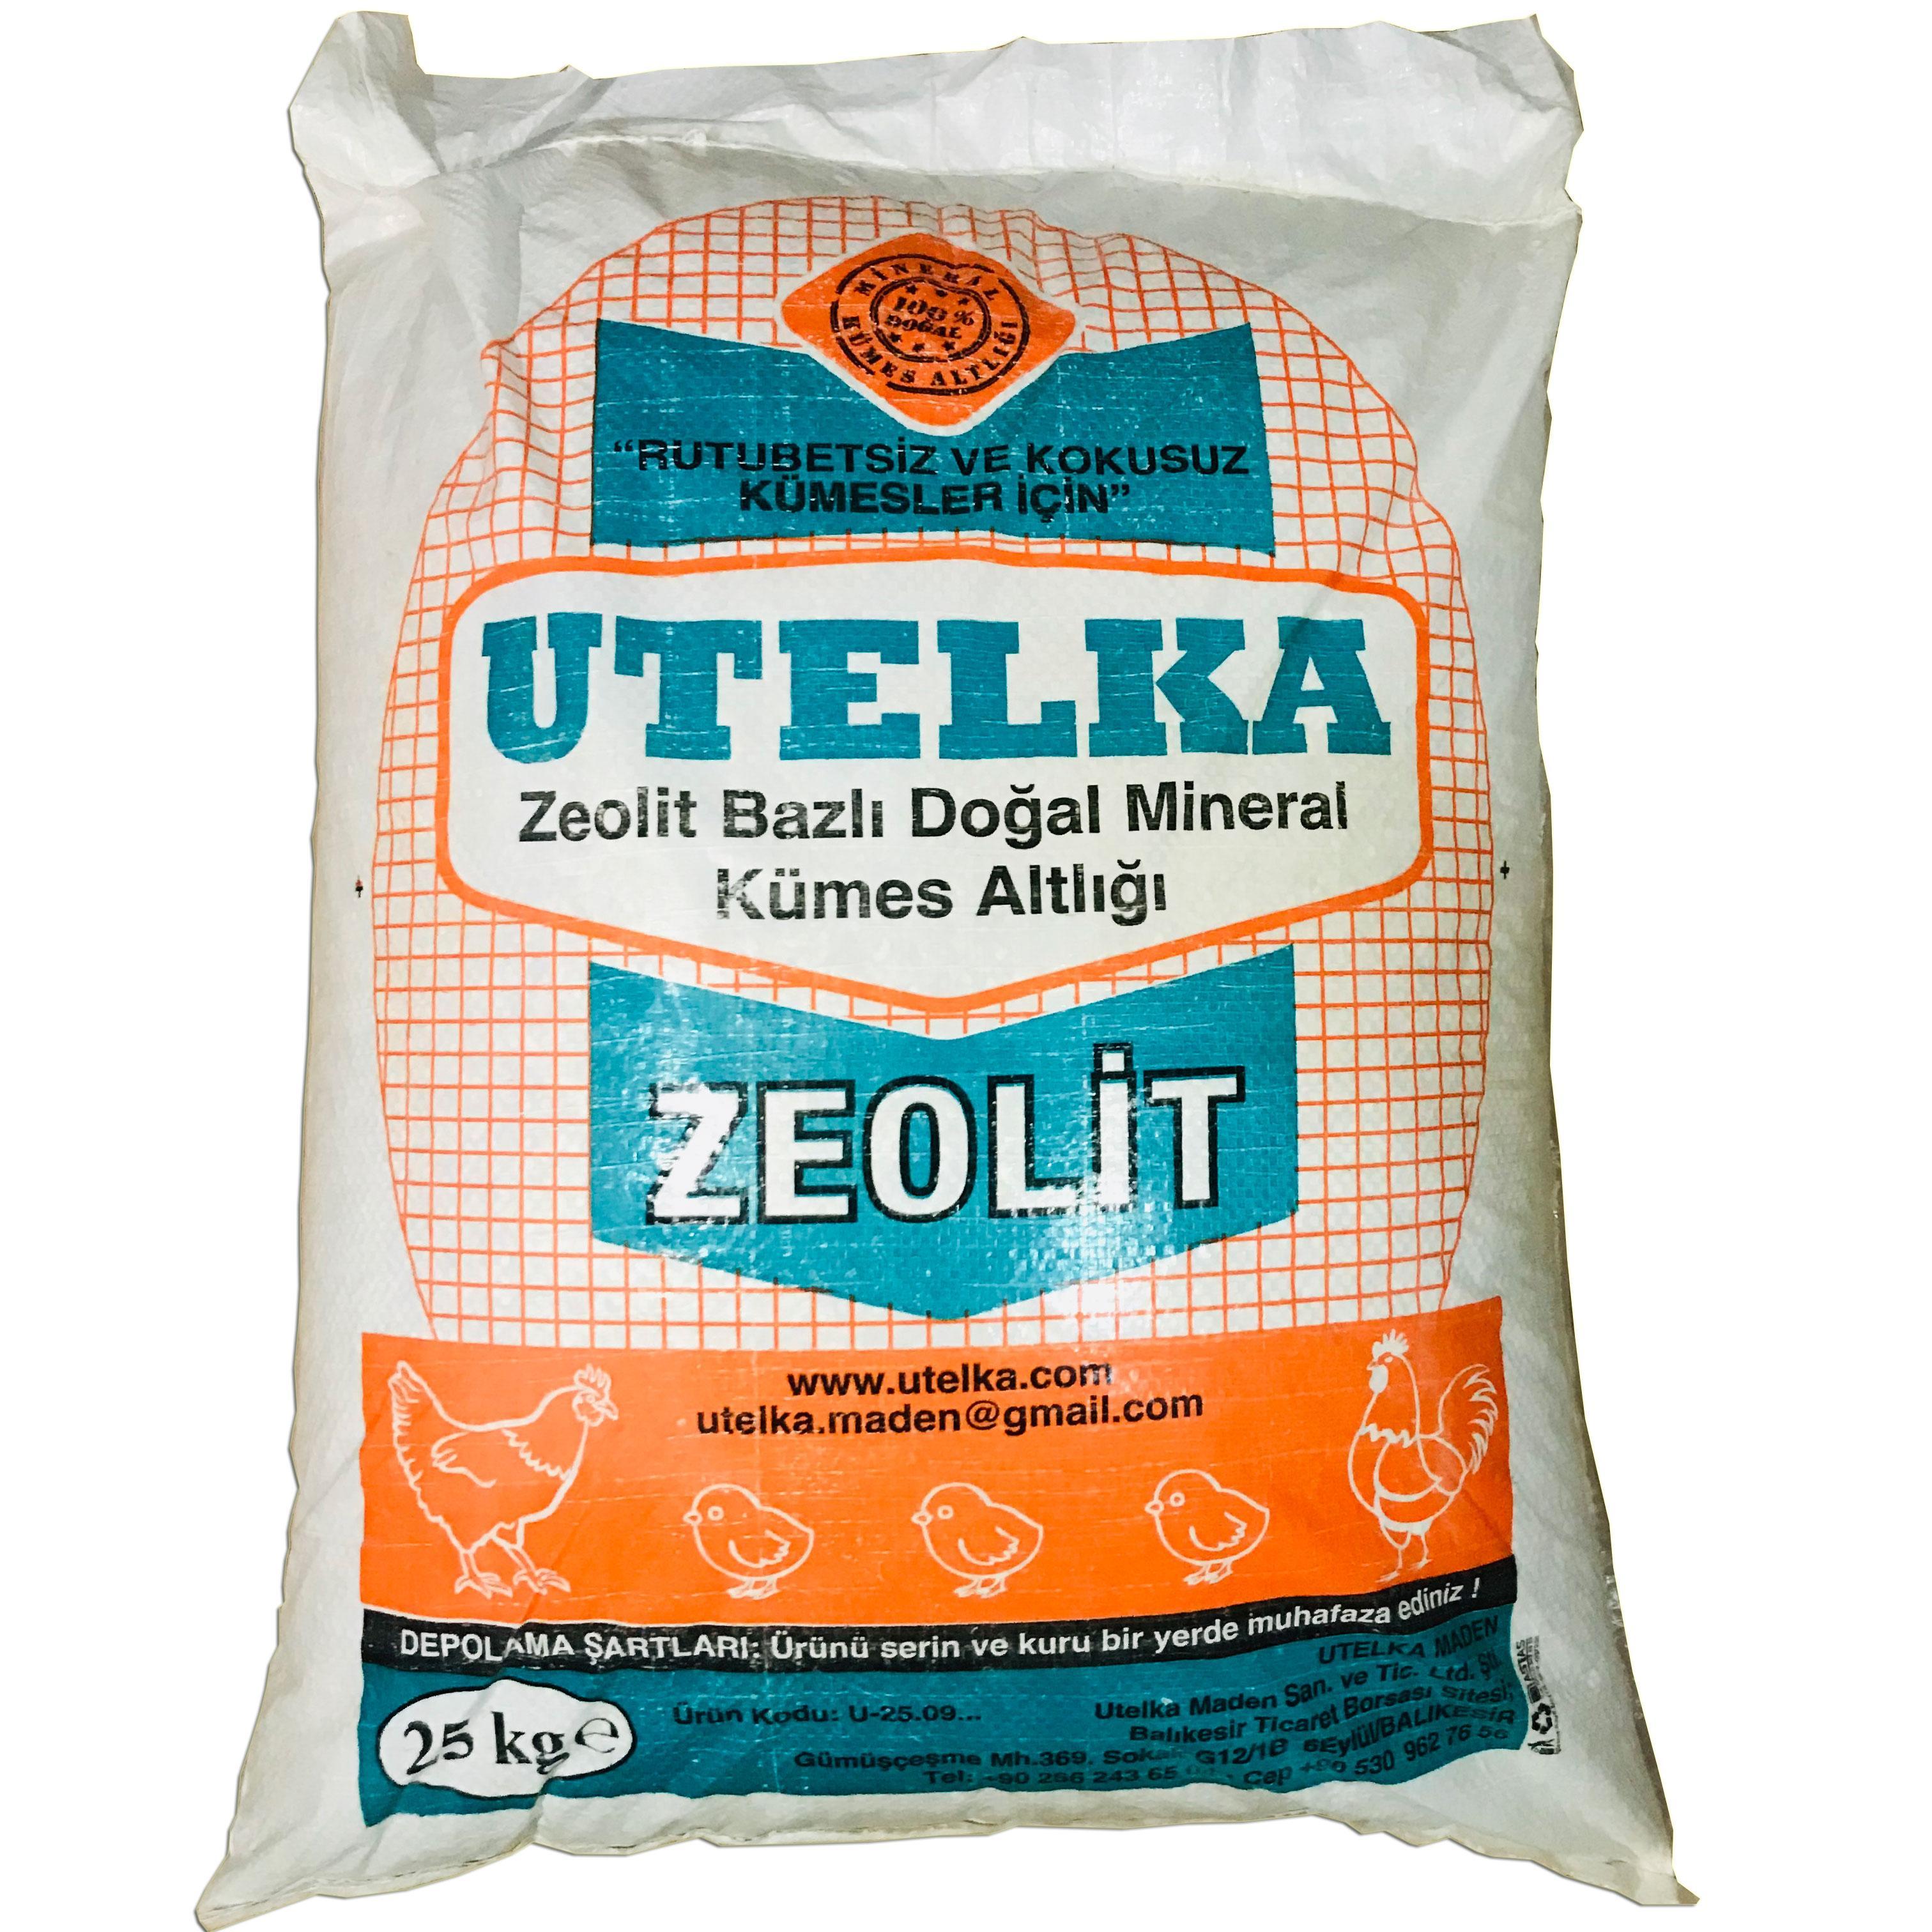 Utelka Zeolit Sheep Cow frango base de coop 25 KG 0-3mm Pet Shop Início Jardim